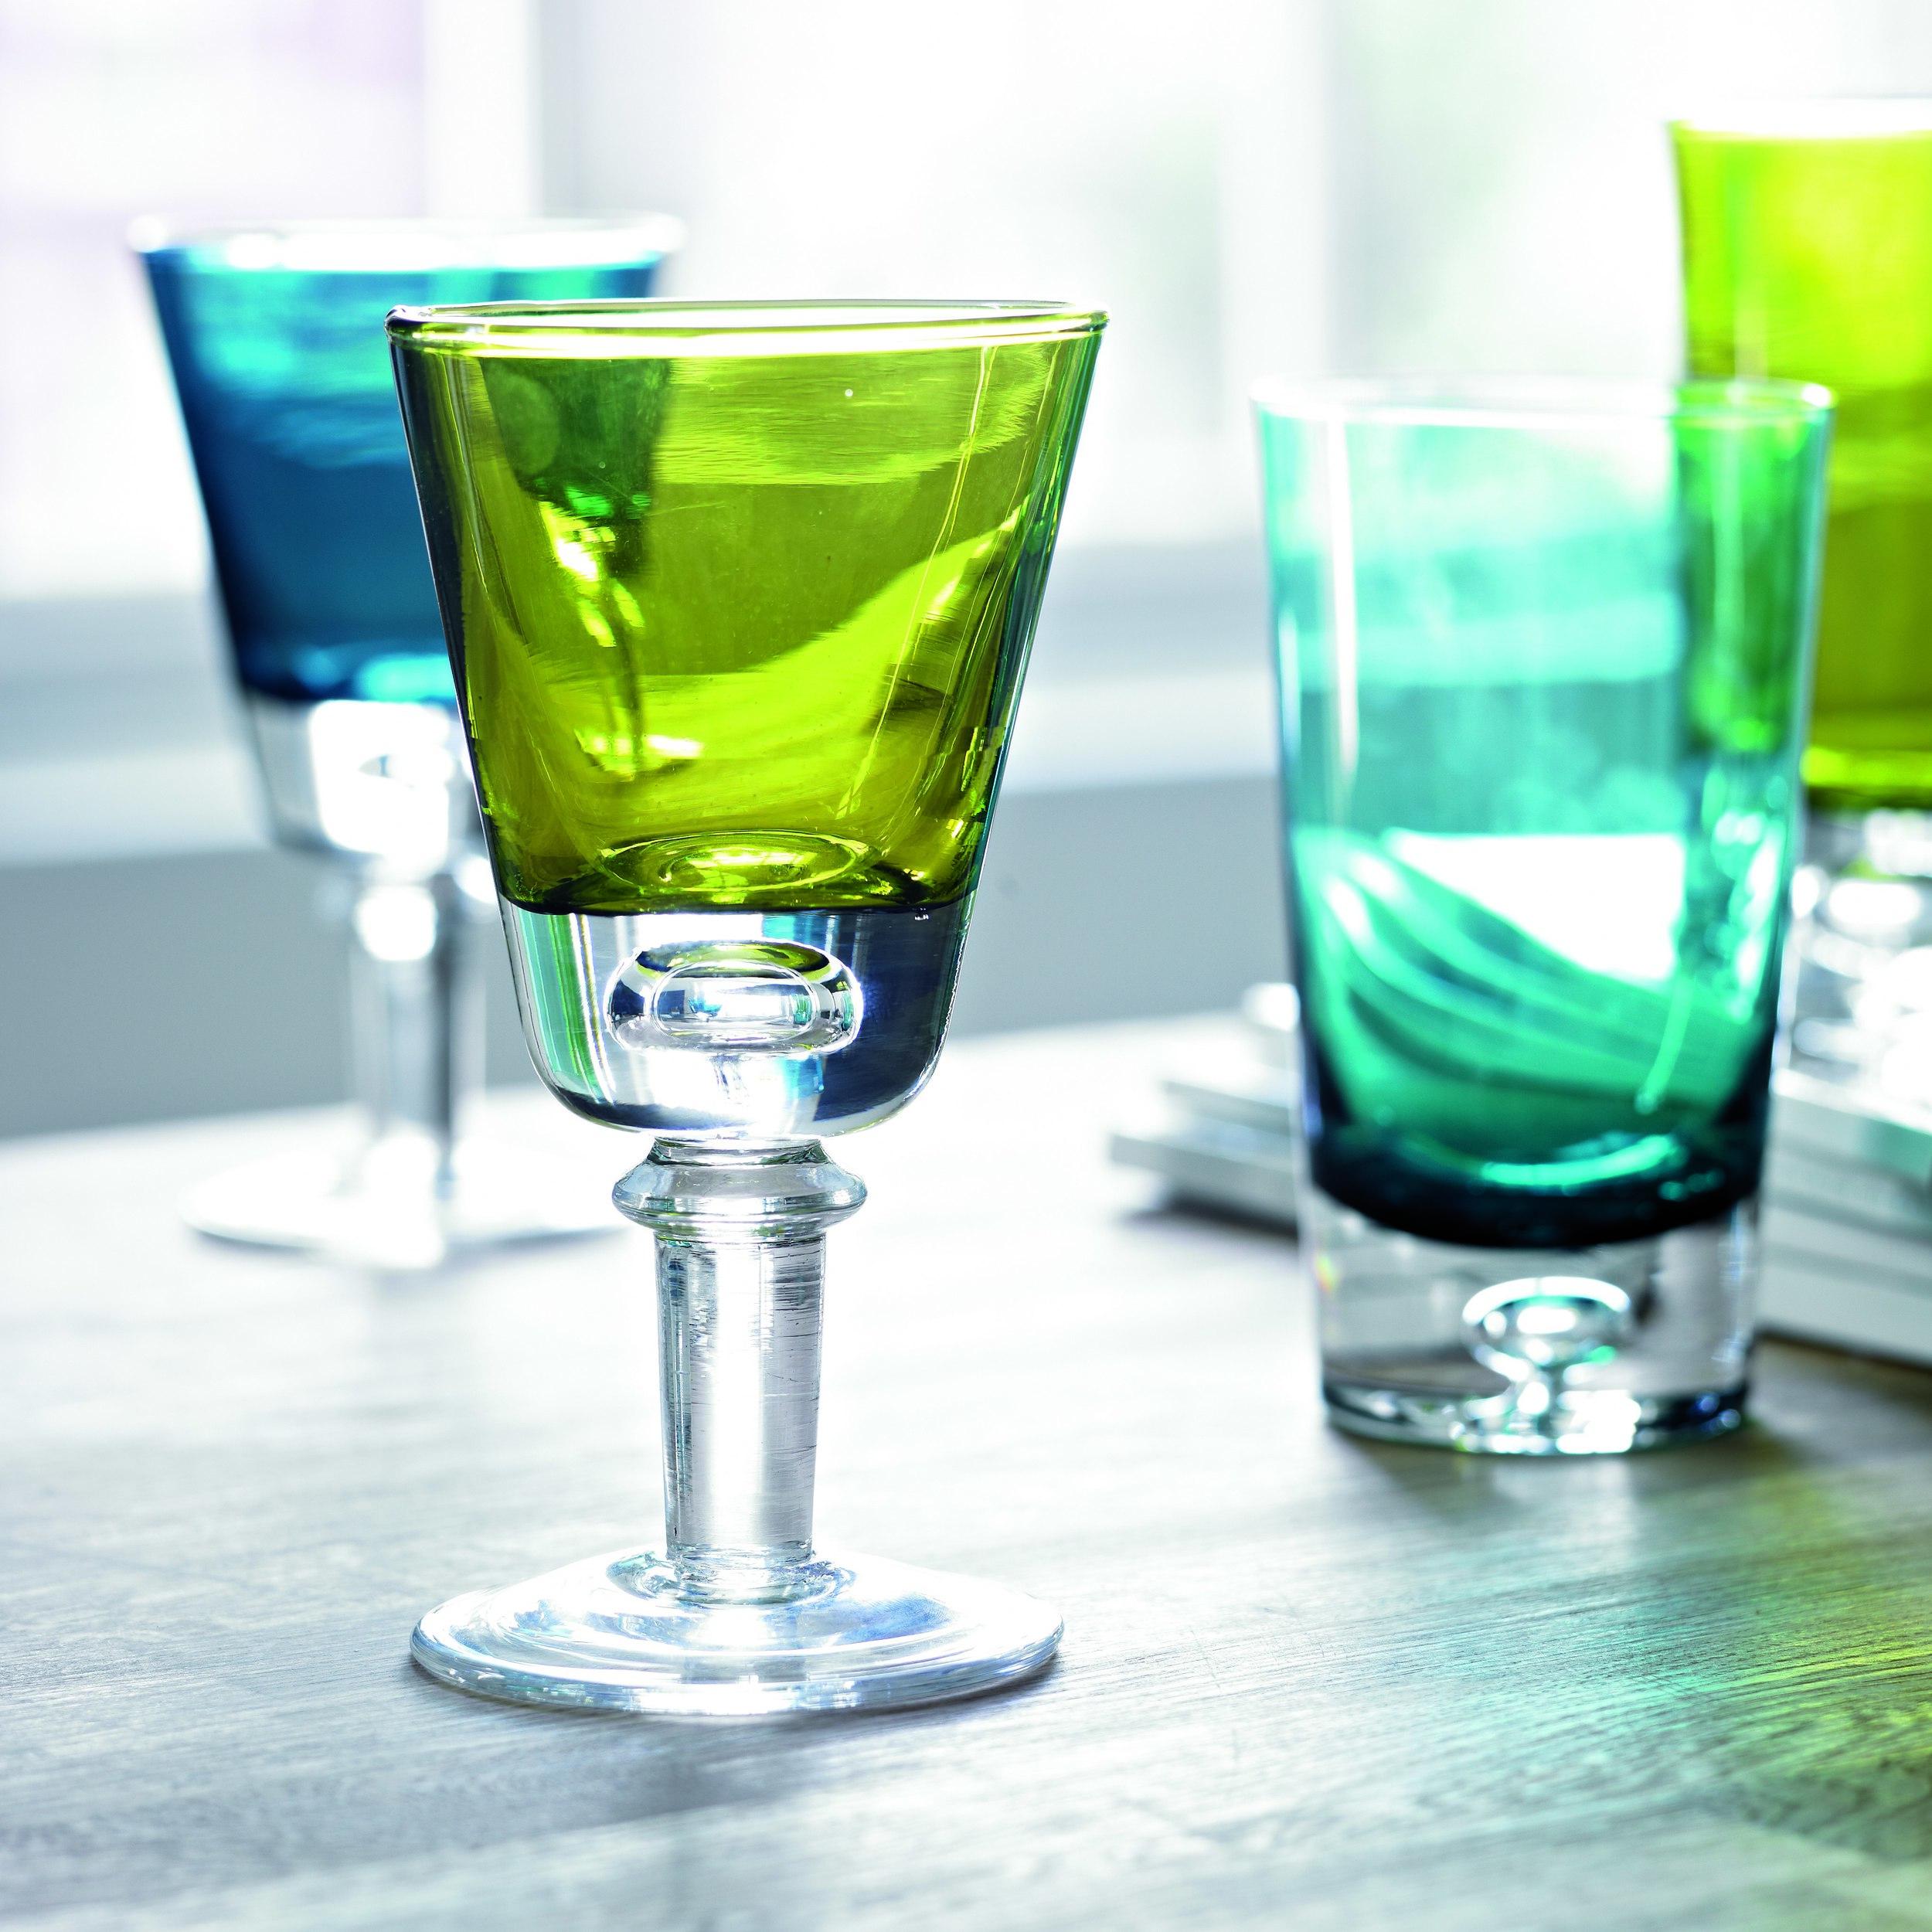 Elements glassware image.jpg